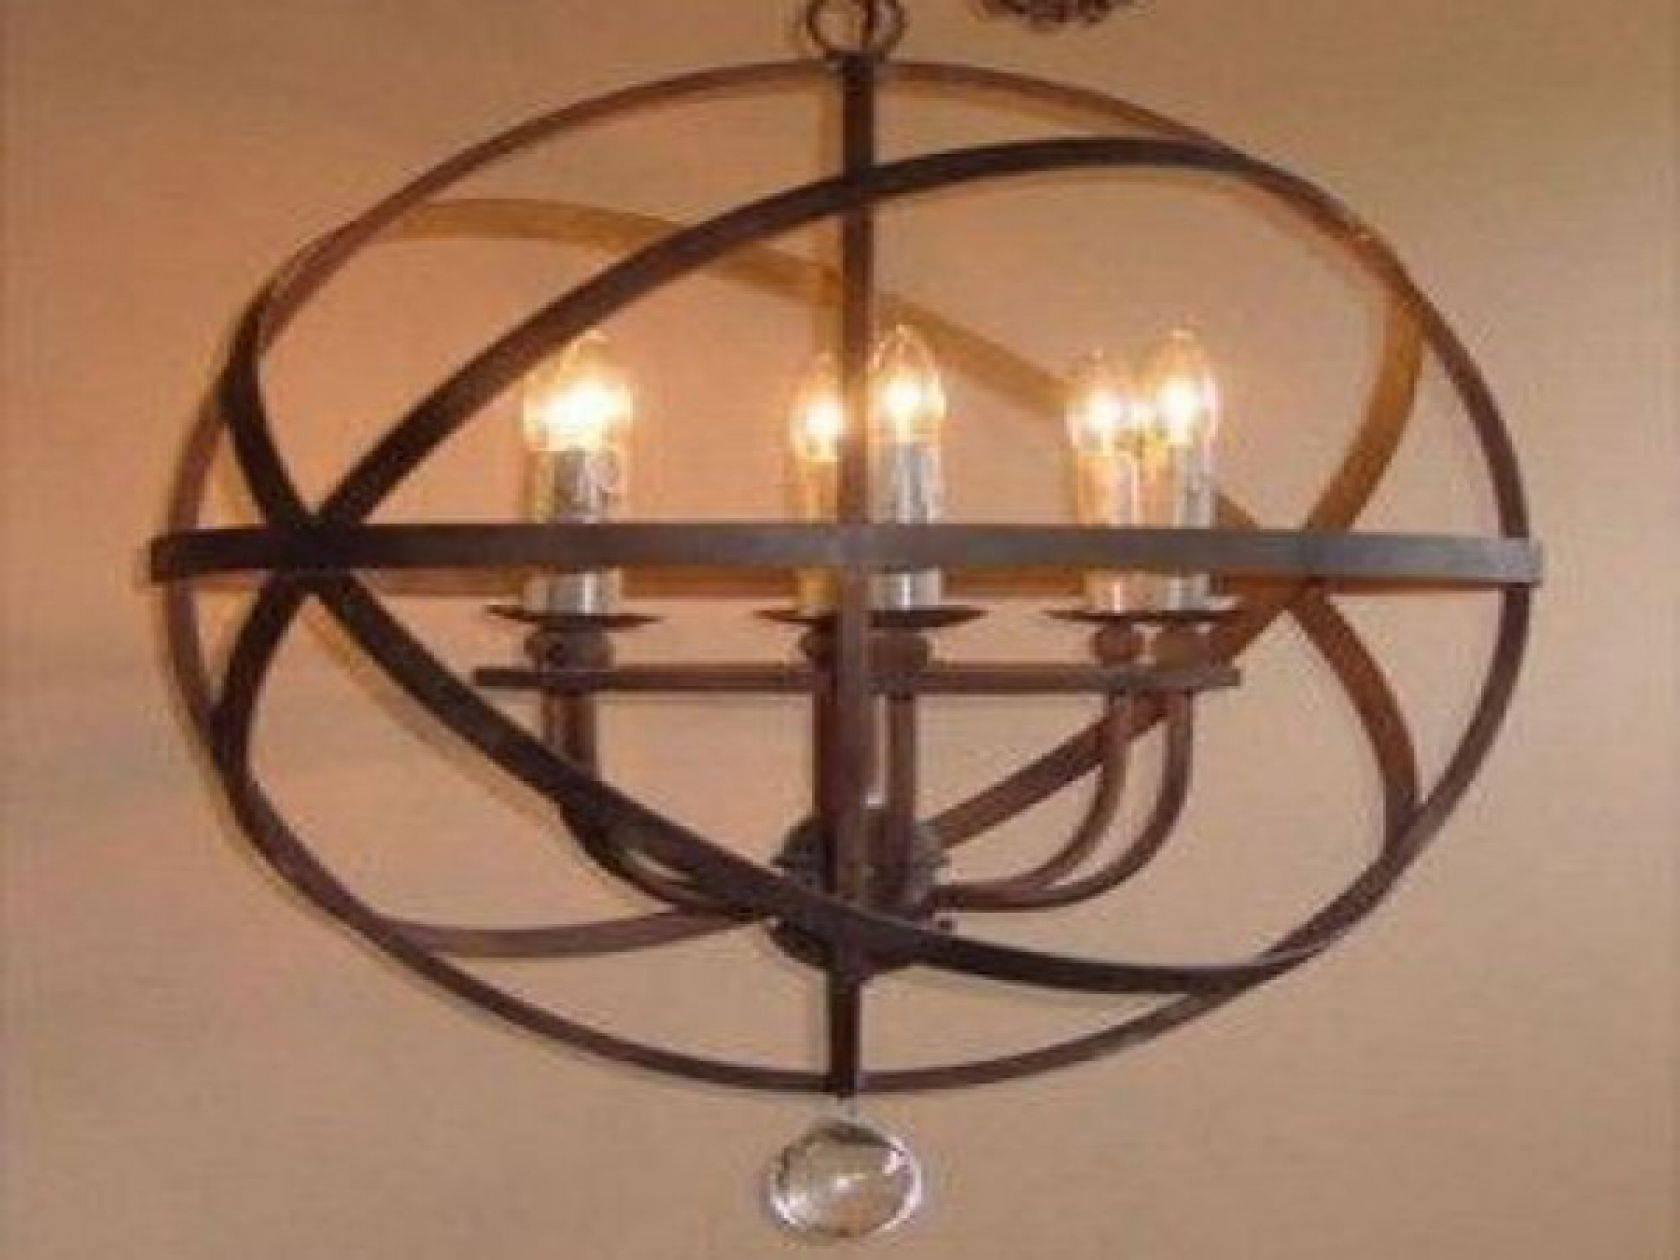 Nautical Lighting, Coastal Lamps, Fixtures & Pendant Lighting pertaining to Indoor Nautical Pendant Lighting (Image 7 of 15)